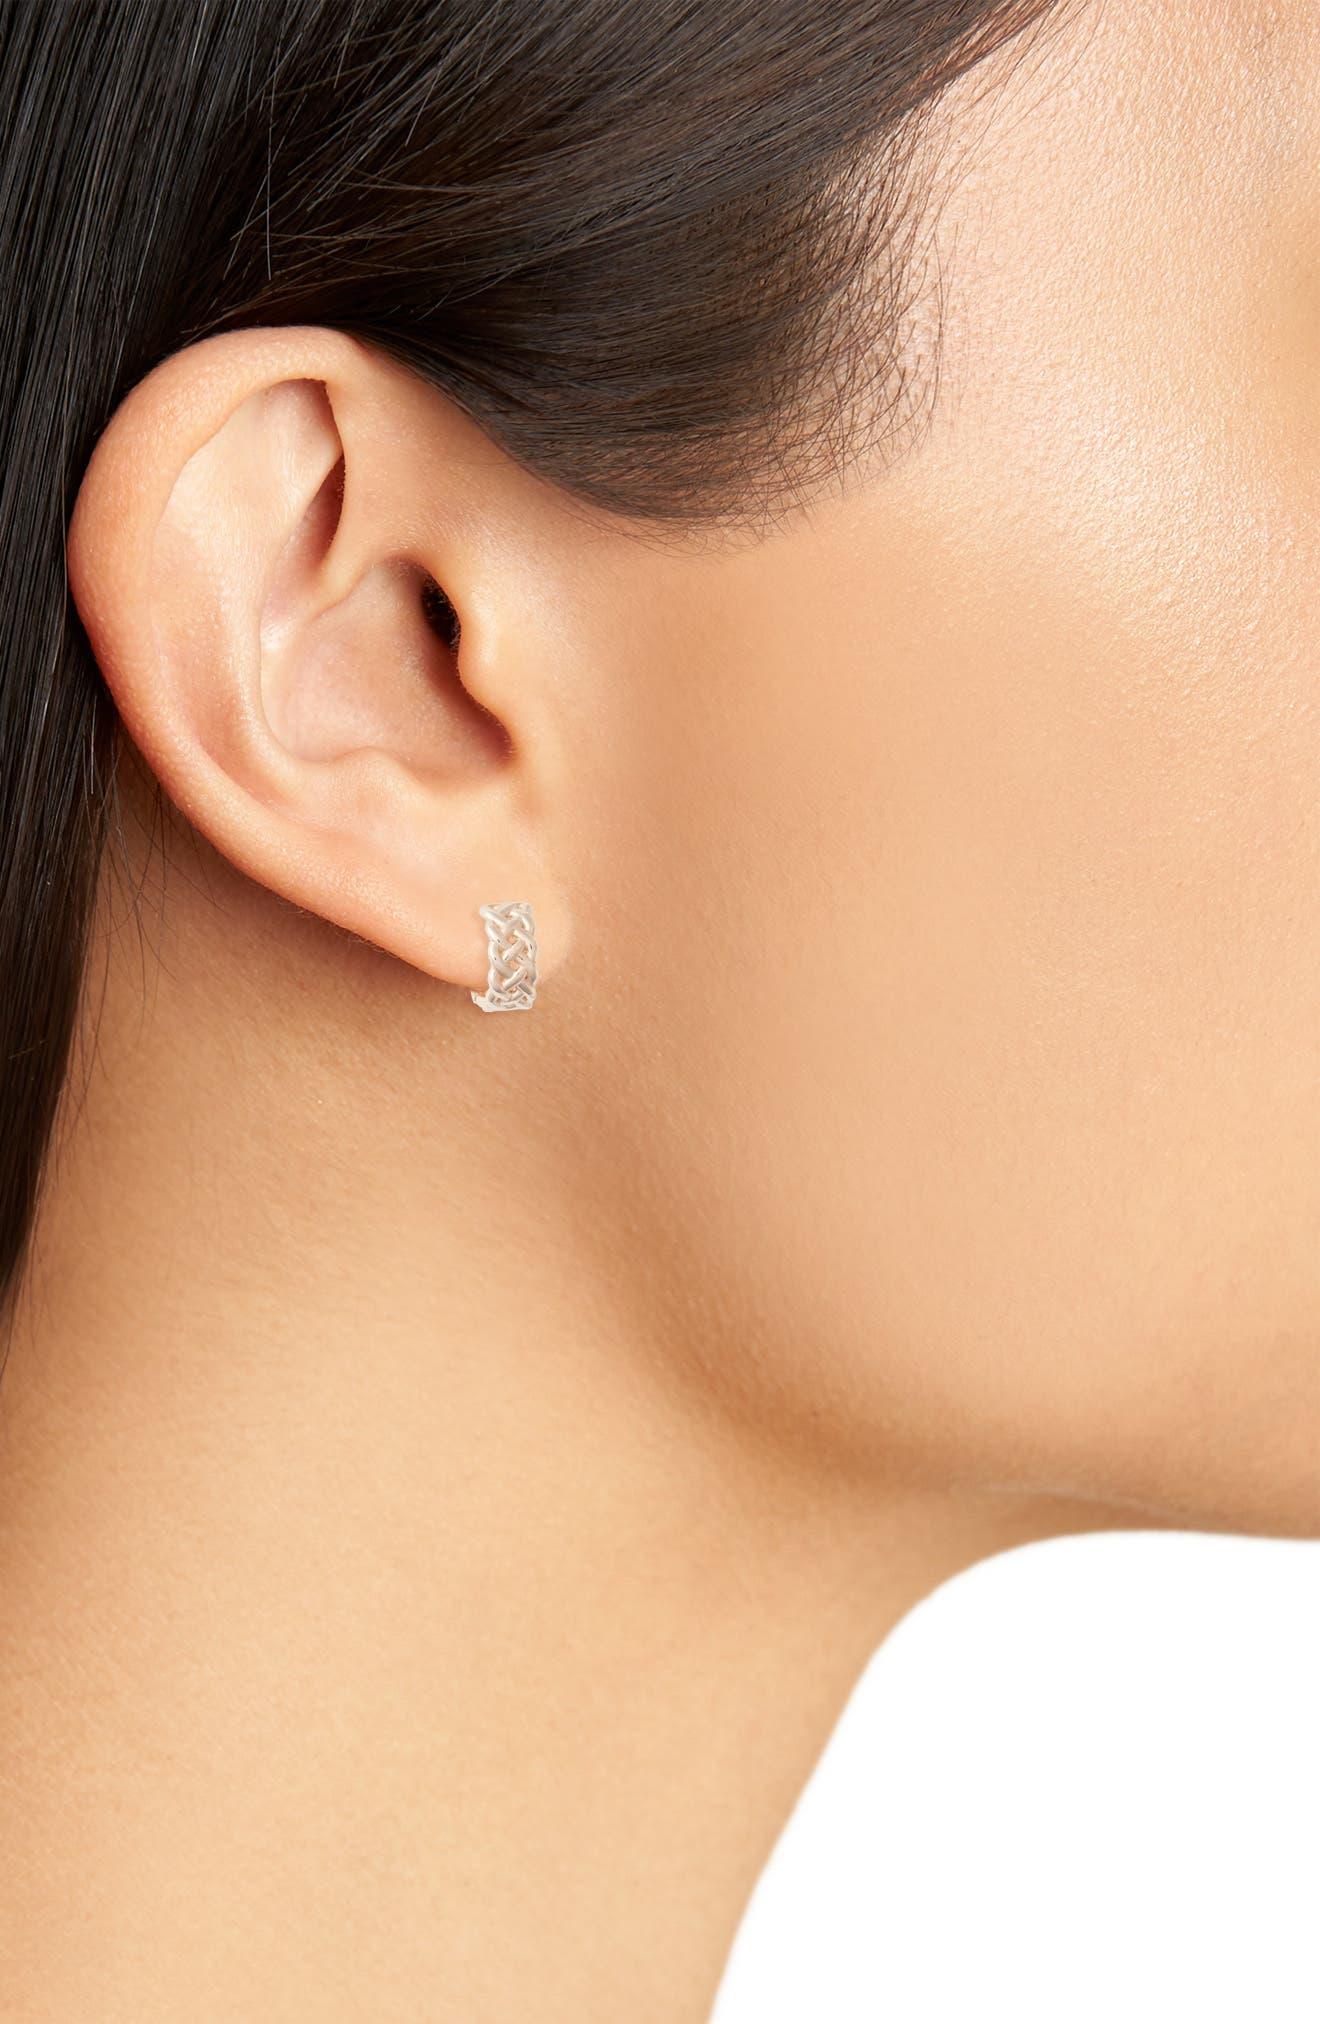 KISMET BY MILKA, Single Braided Gold Hoop Earring, Alternate thumbnail 2, color, ROSE GOLD